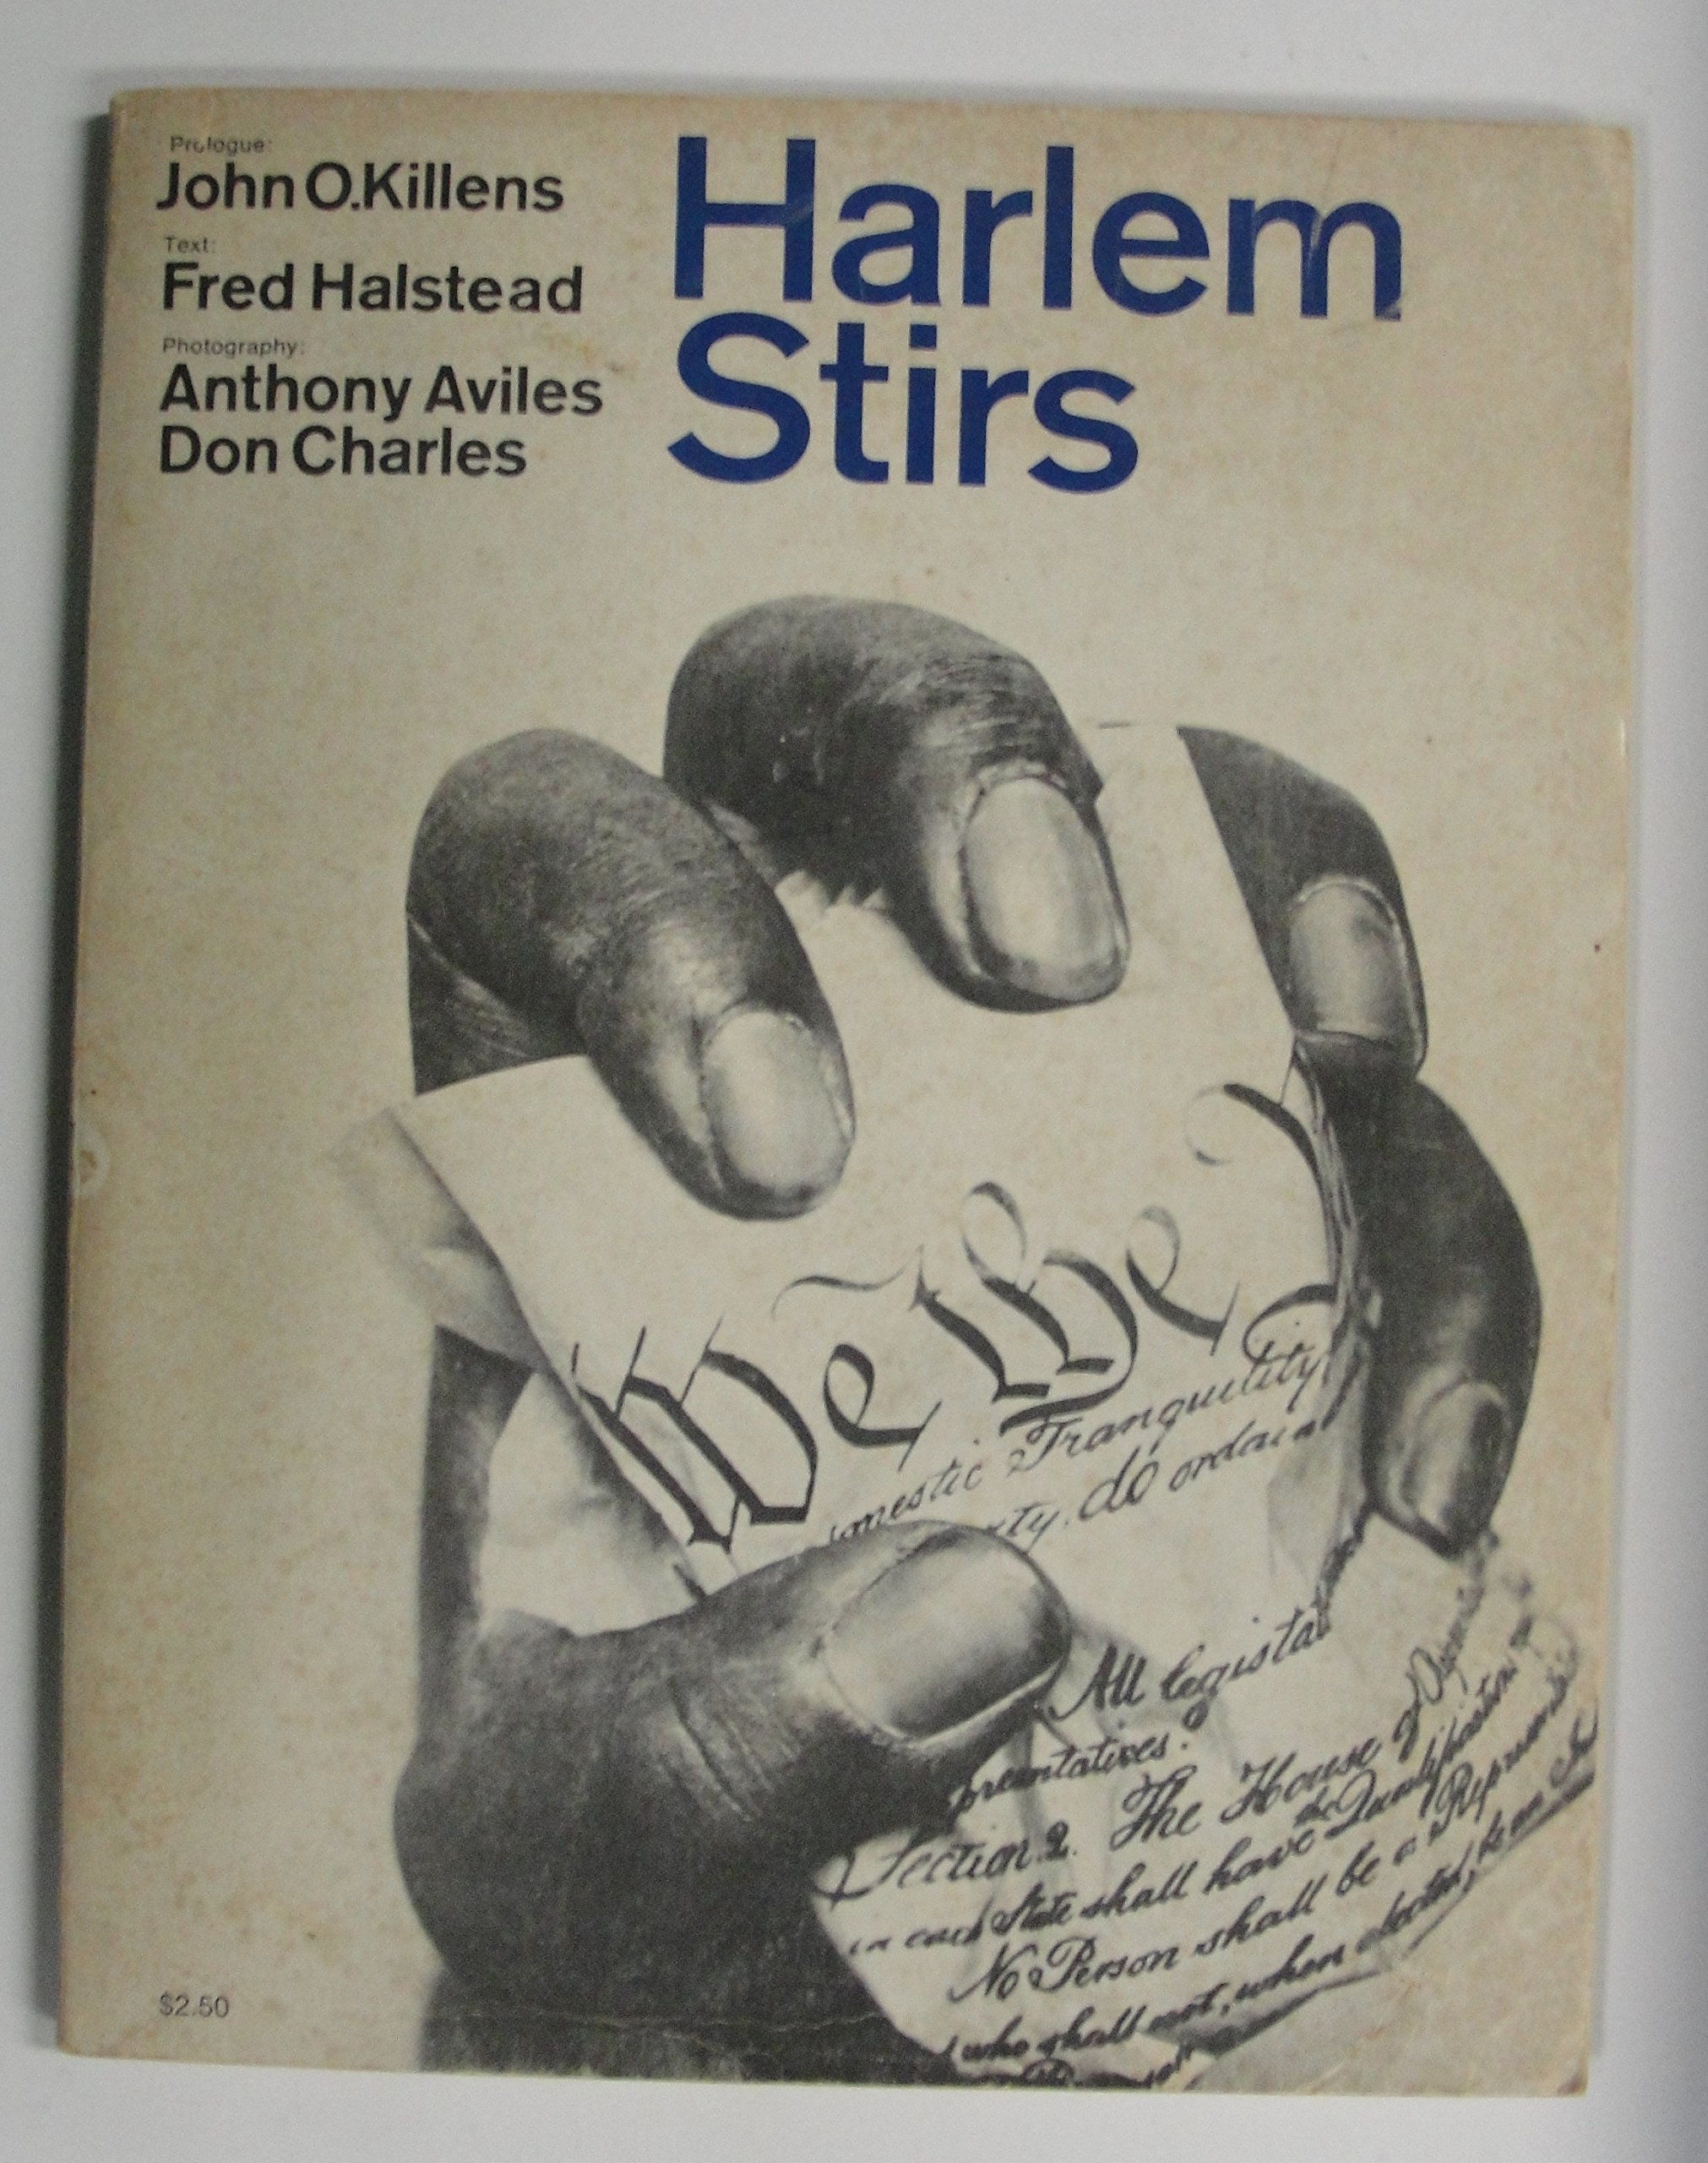 Amazon.com: Harlem stirs. Prologue John O. Killens ...